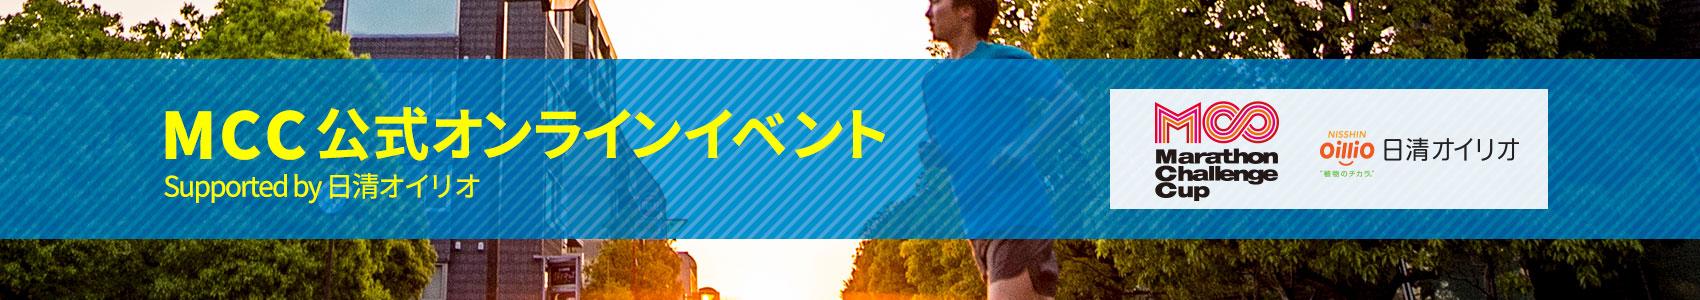 MCC公式オンラインイベント【公式】